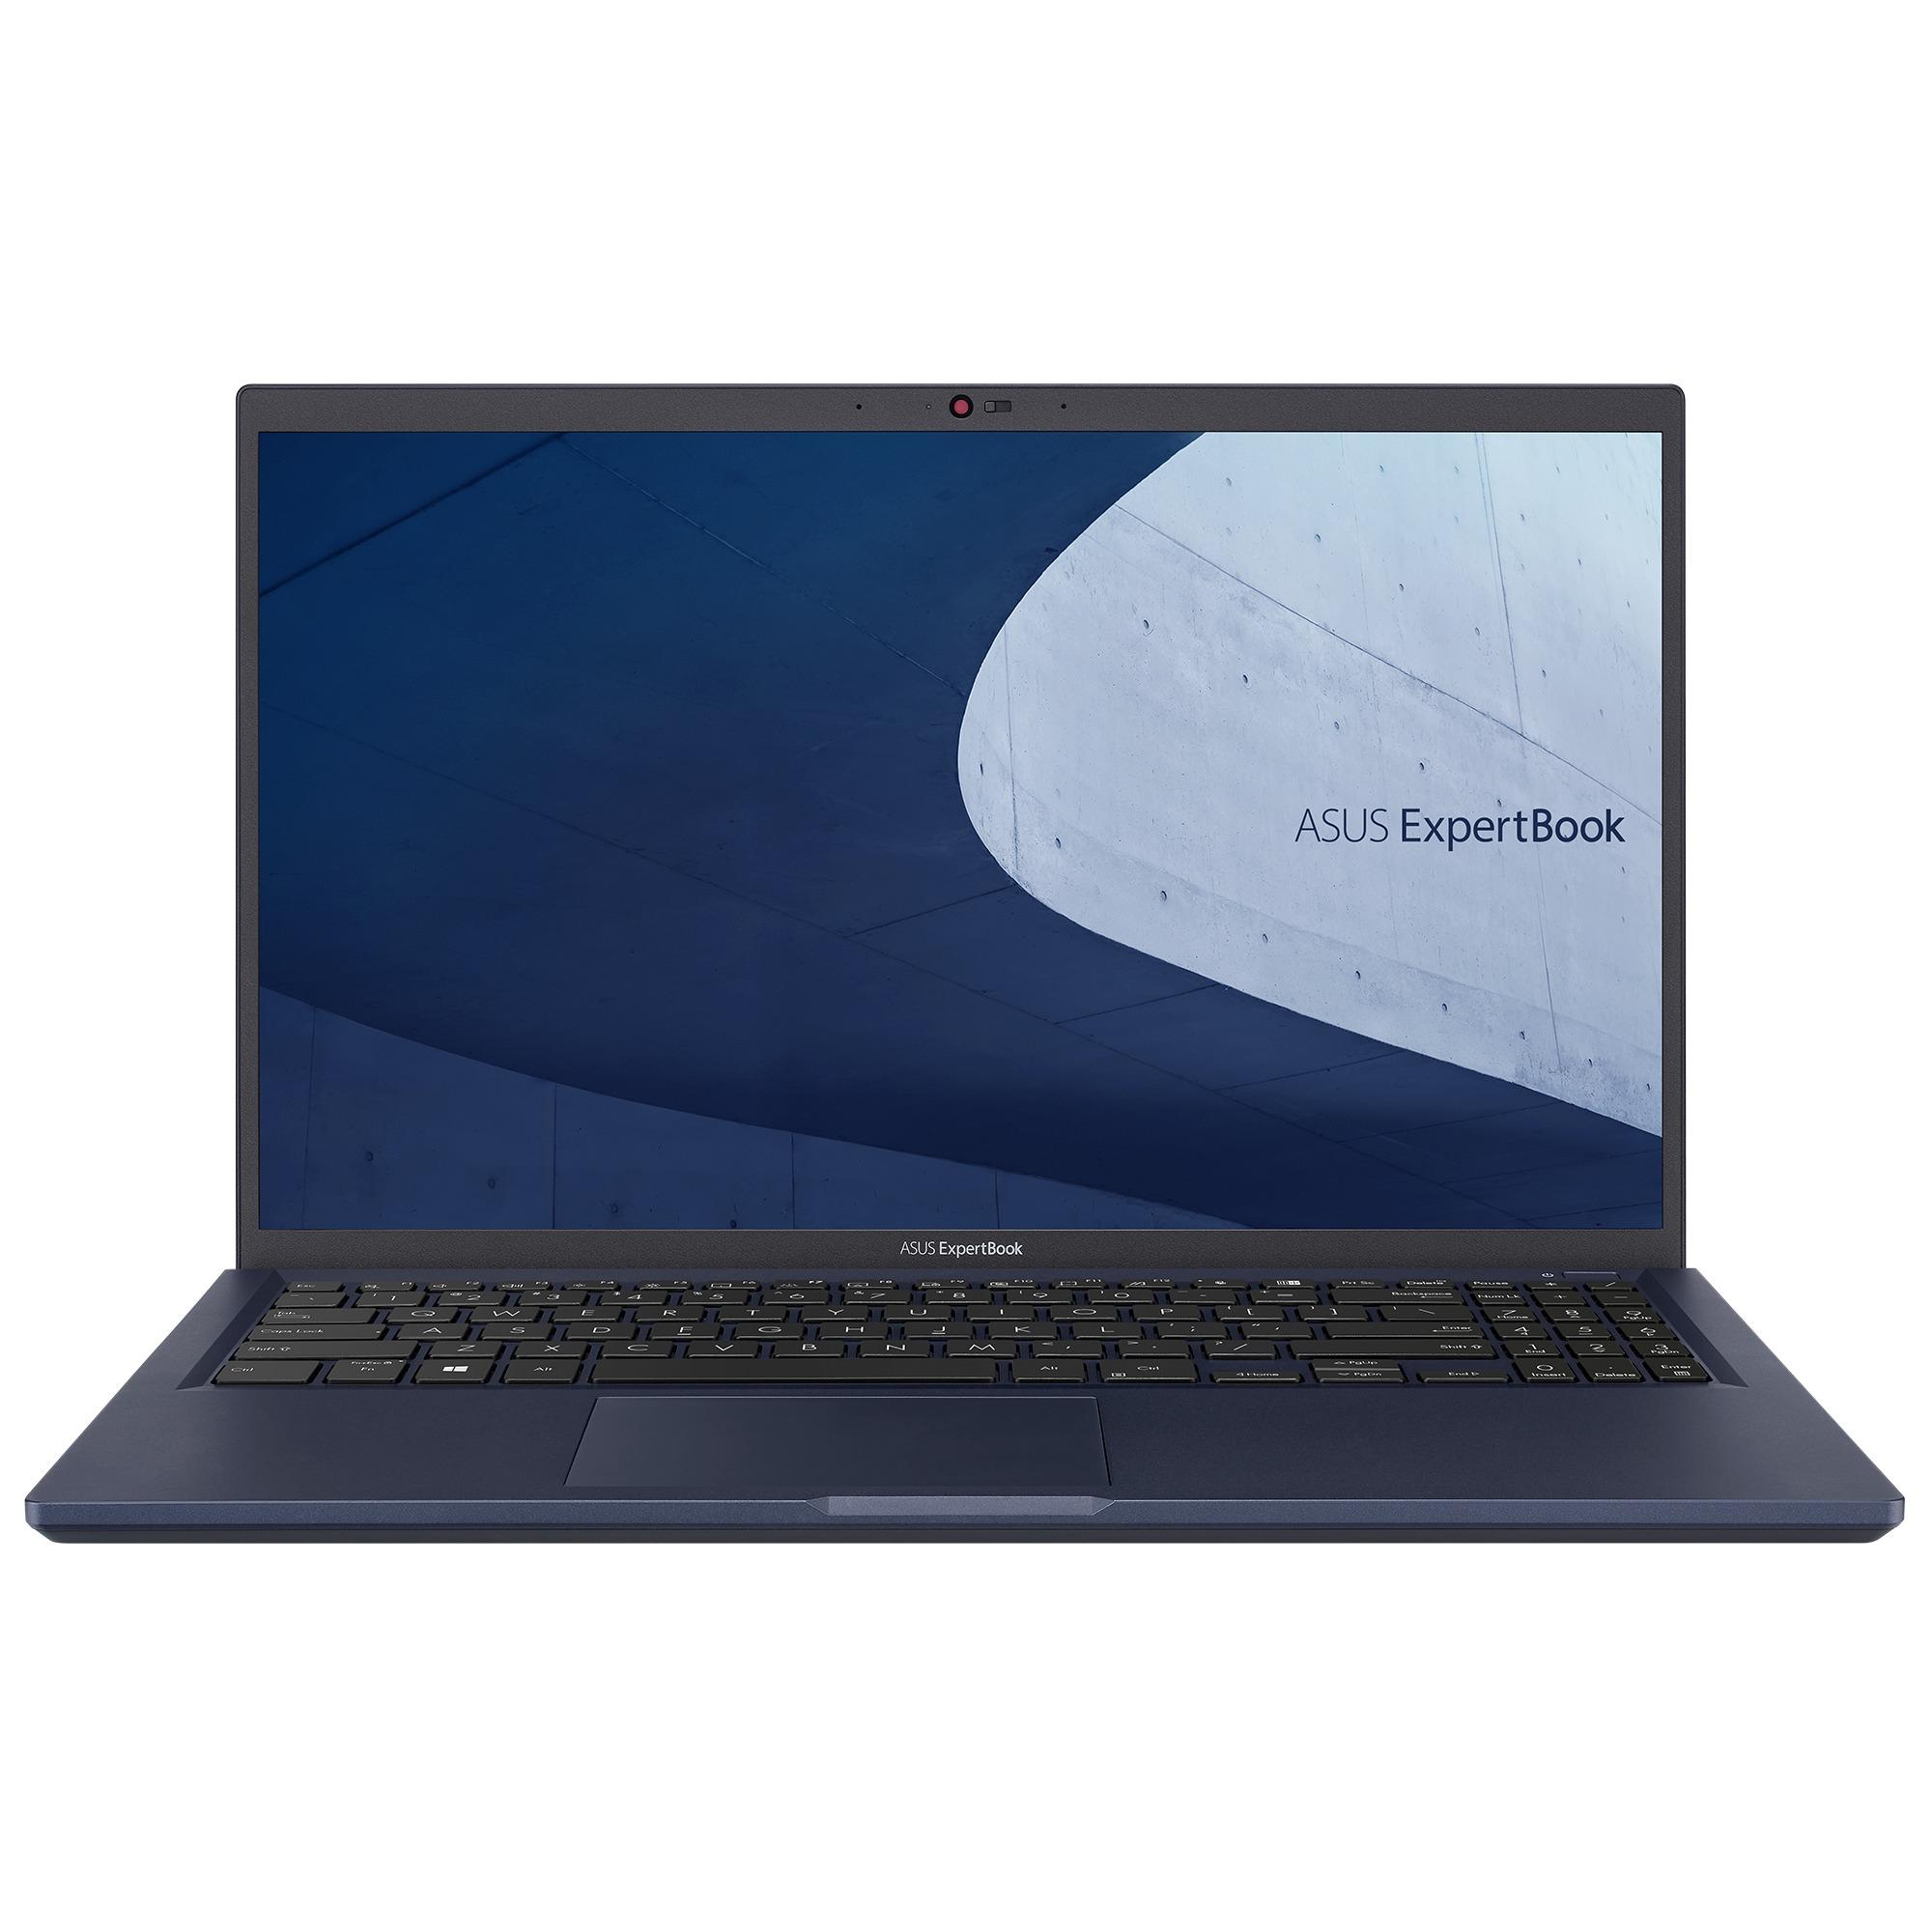 ASUS ExpertBook B1500/15,6''/i3-1115G4 (2C/4T)/8GB/256GB SSD/FPR/TPM/W10P-EDU/Black/2Y PUR - B1500CEAE-BQ1638RA